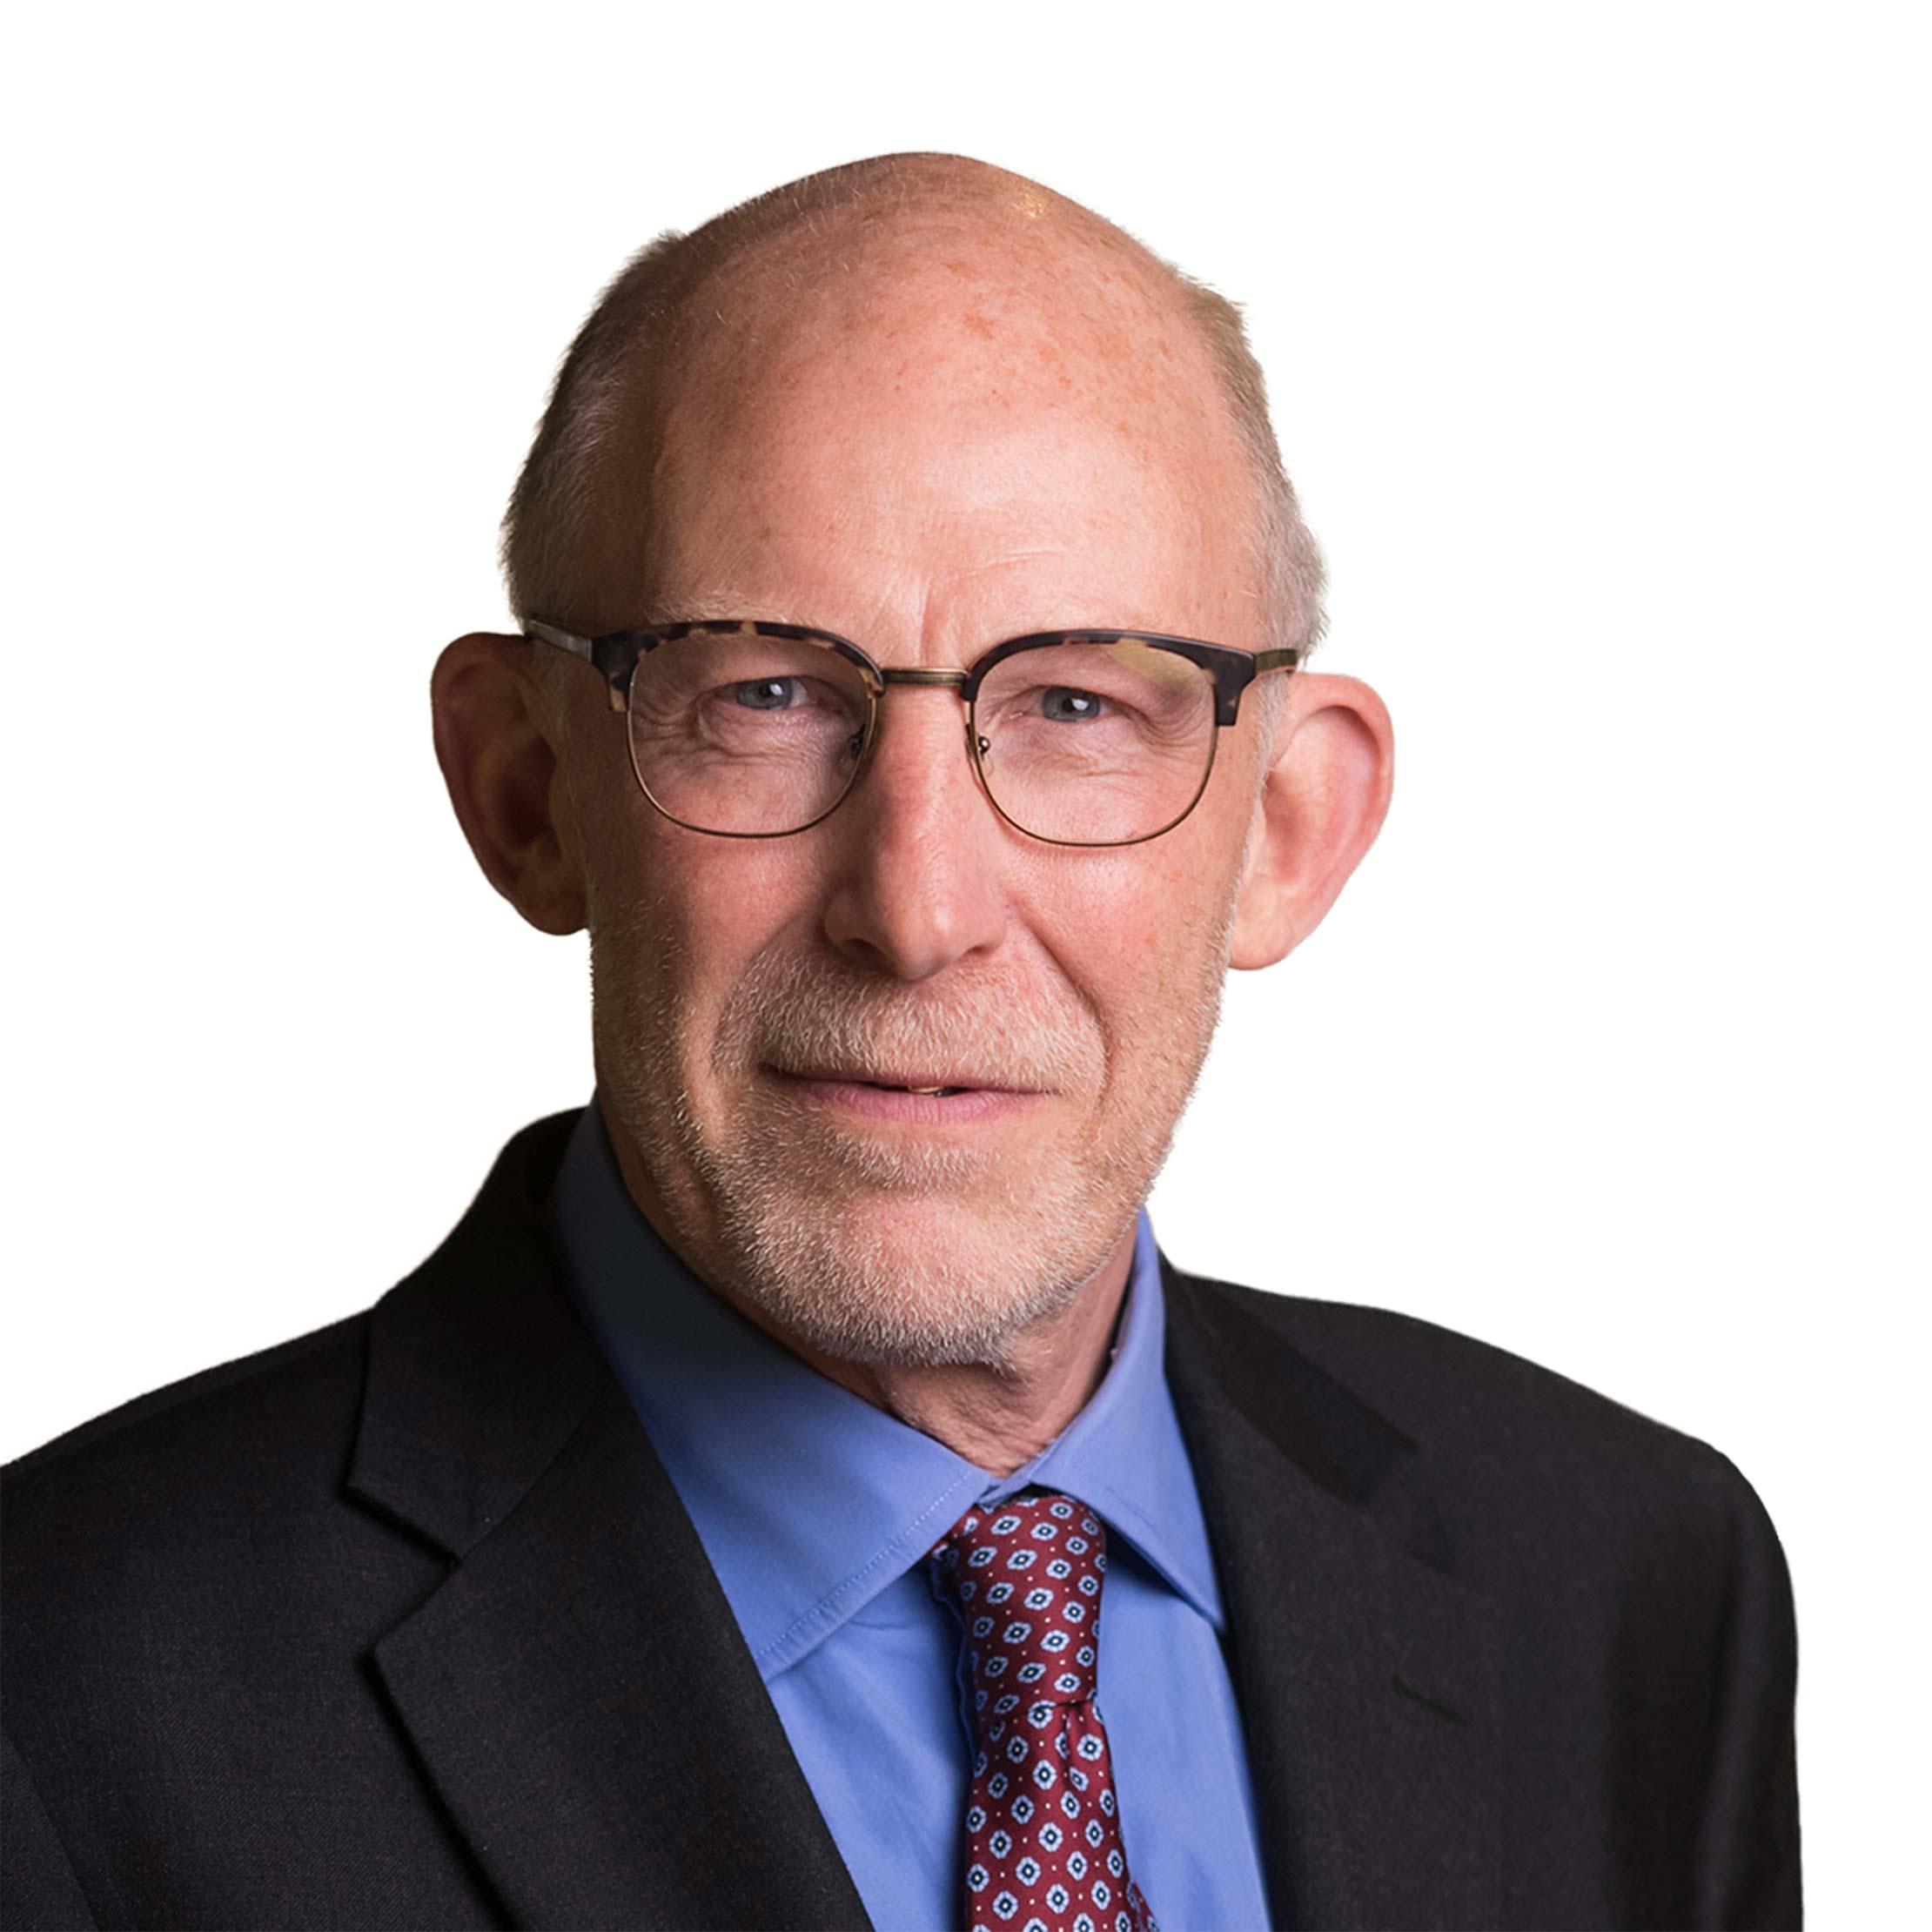 Guy van Zwanenberg